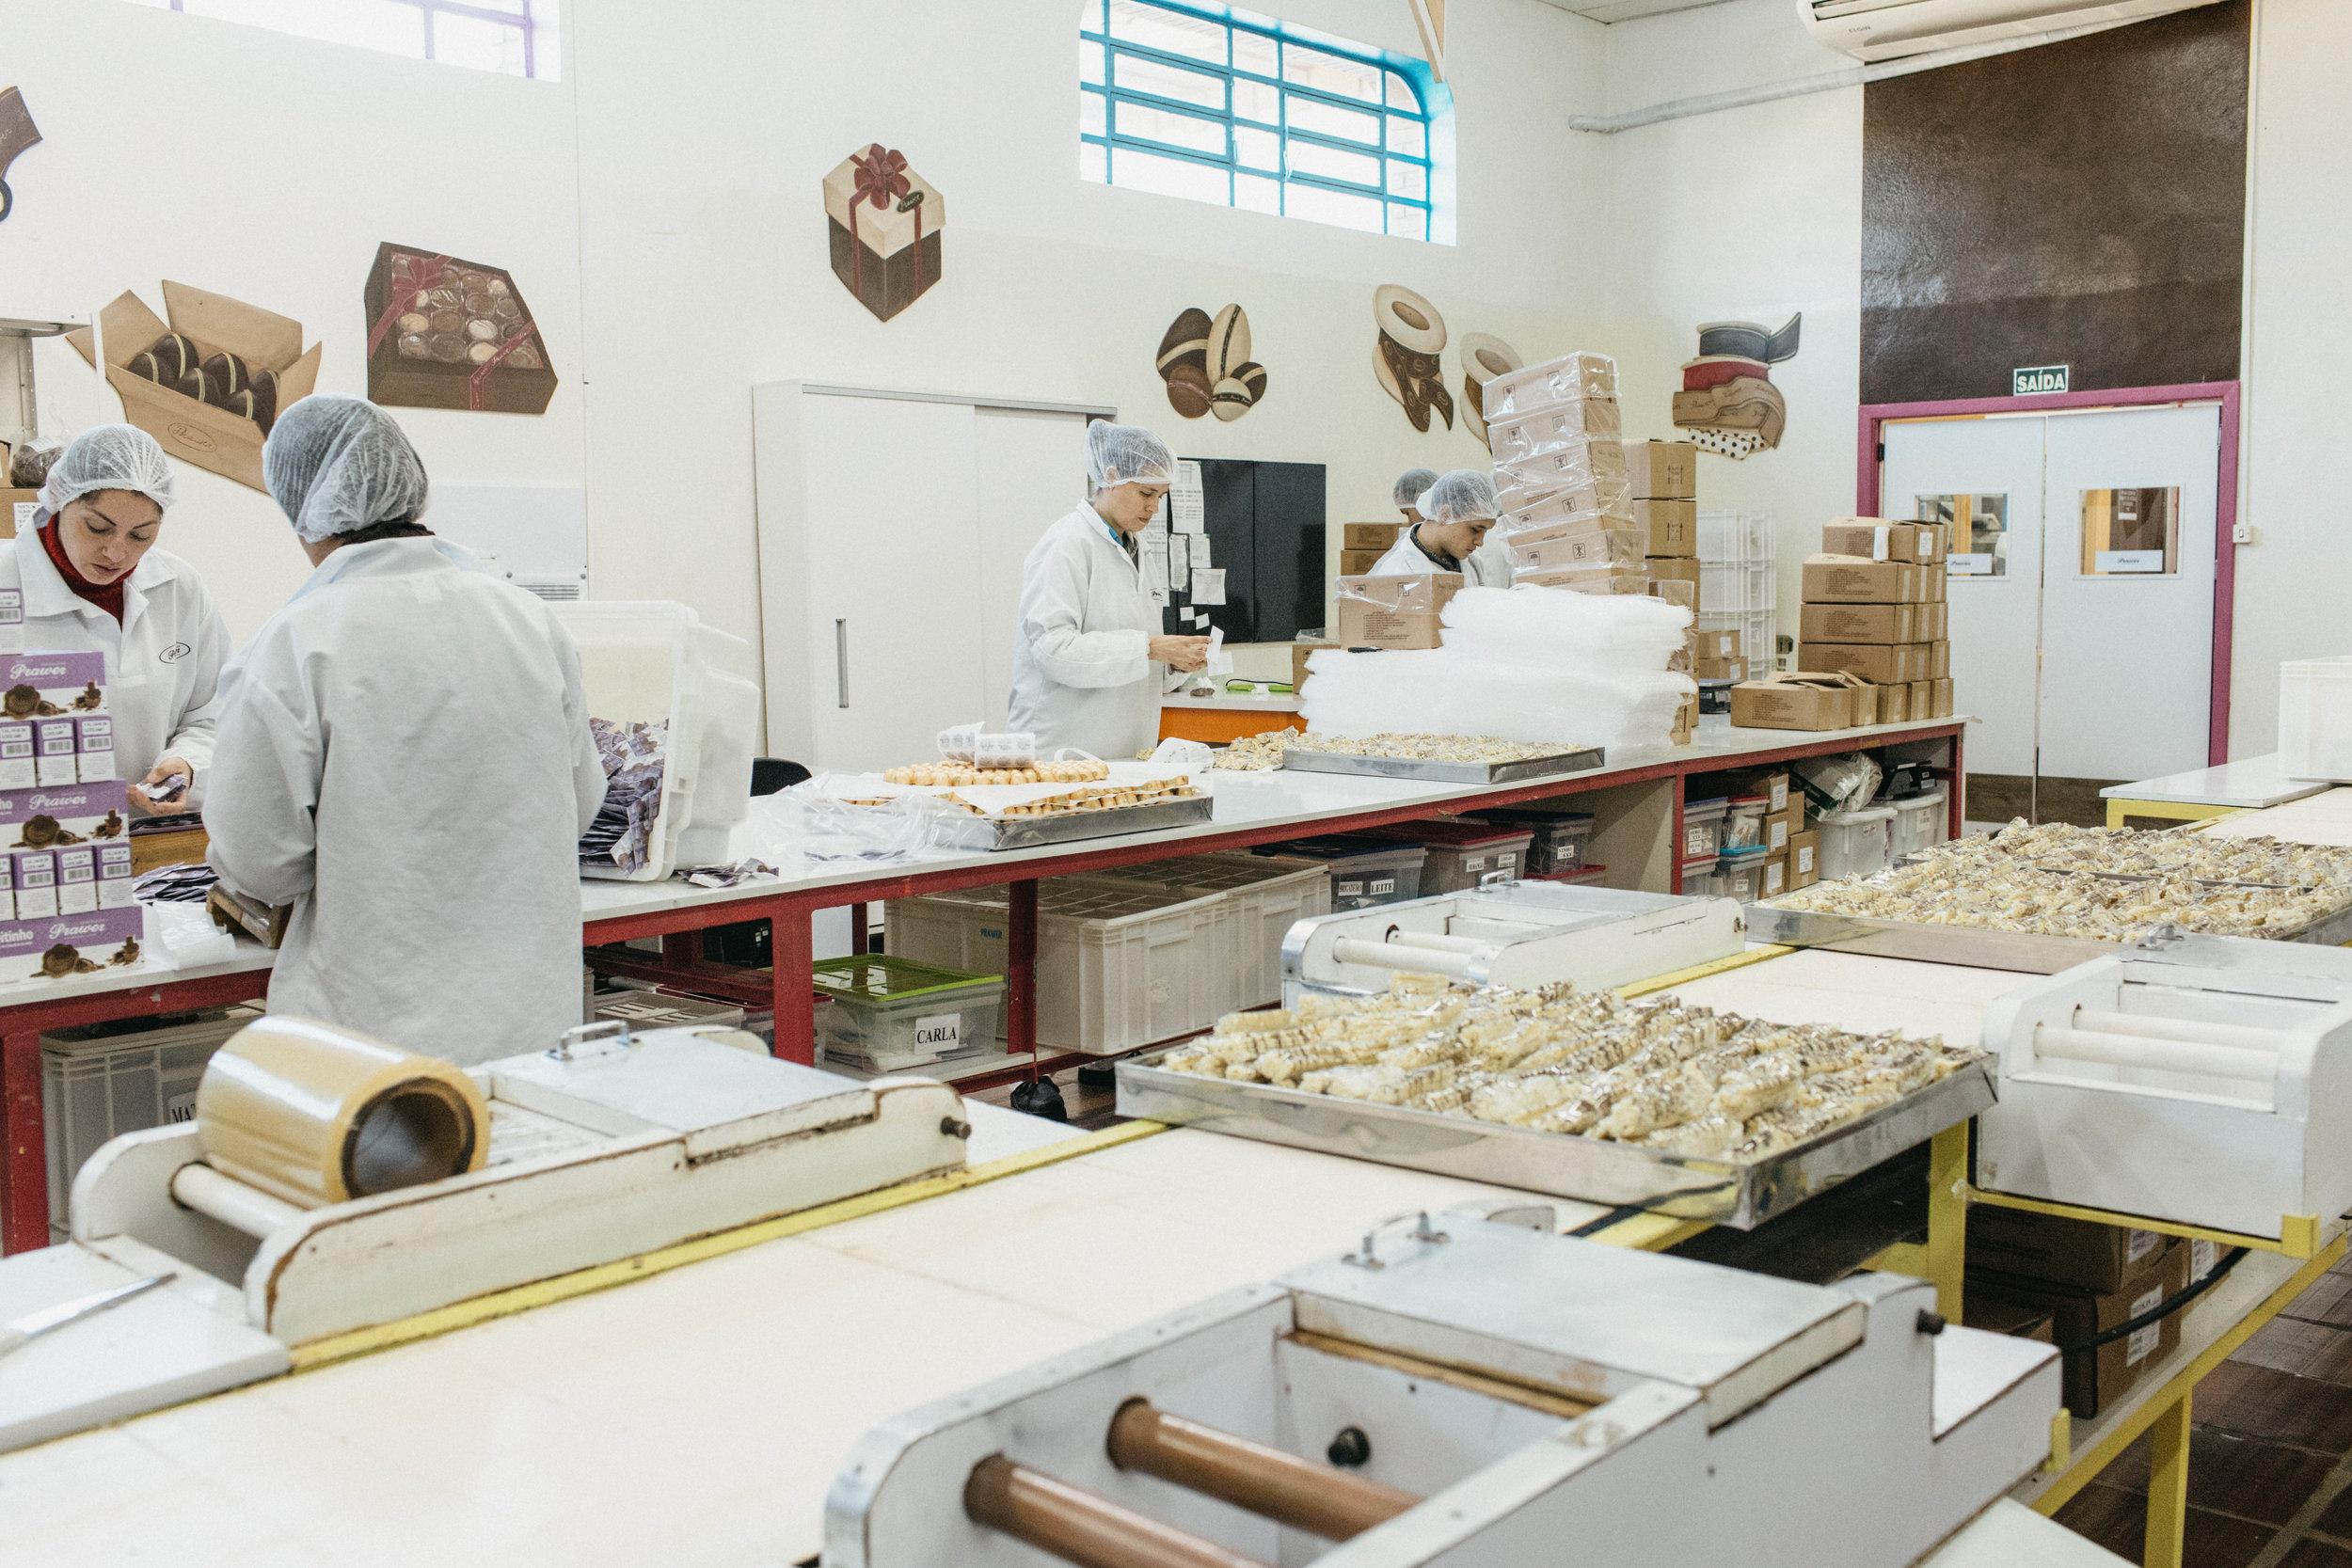 fabrica chocolate prawer artesanal gramado